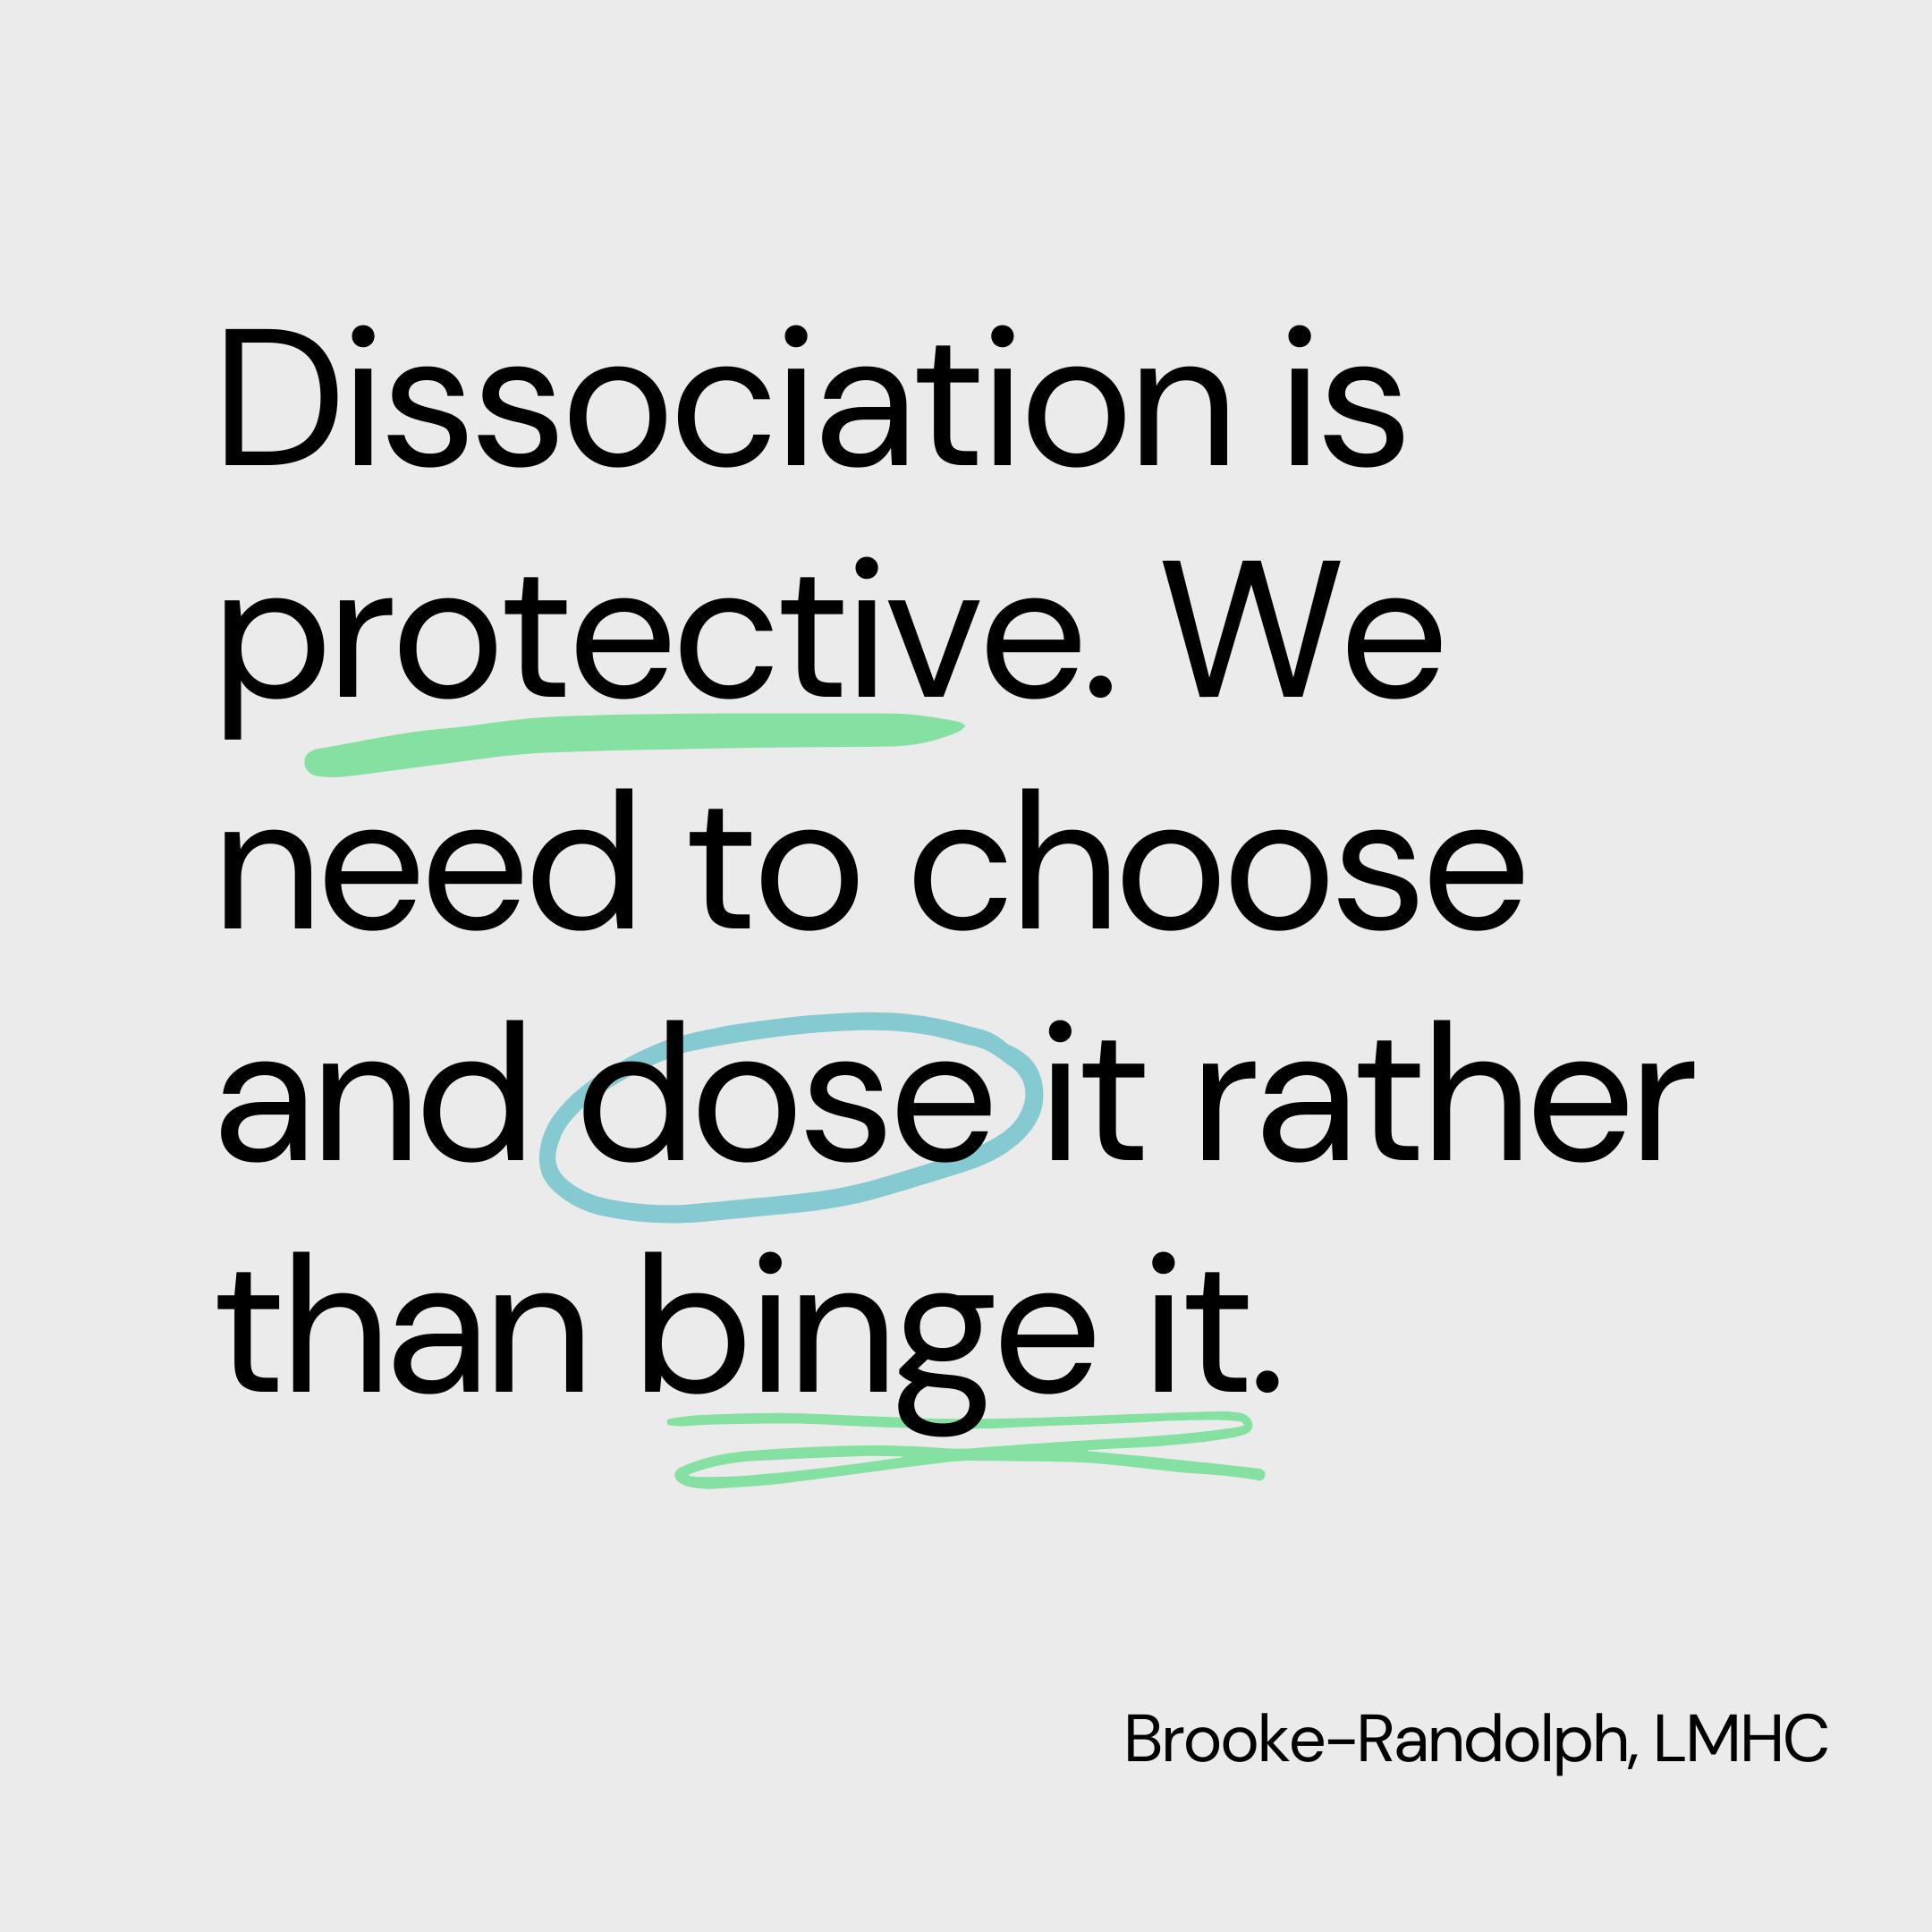 dissociation protective dose binge